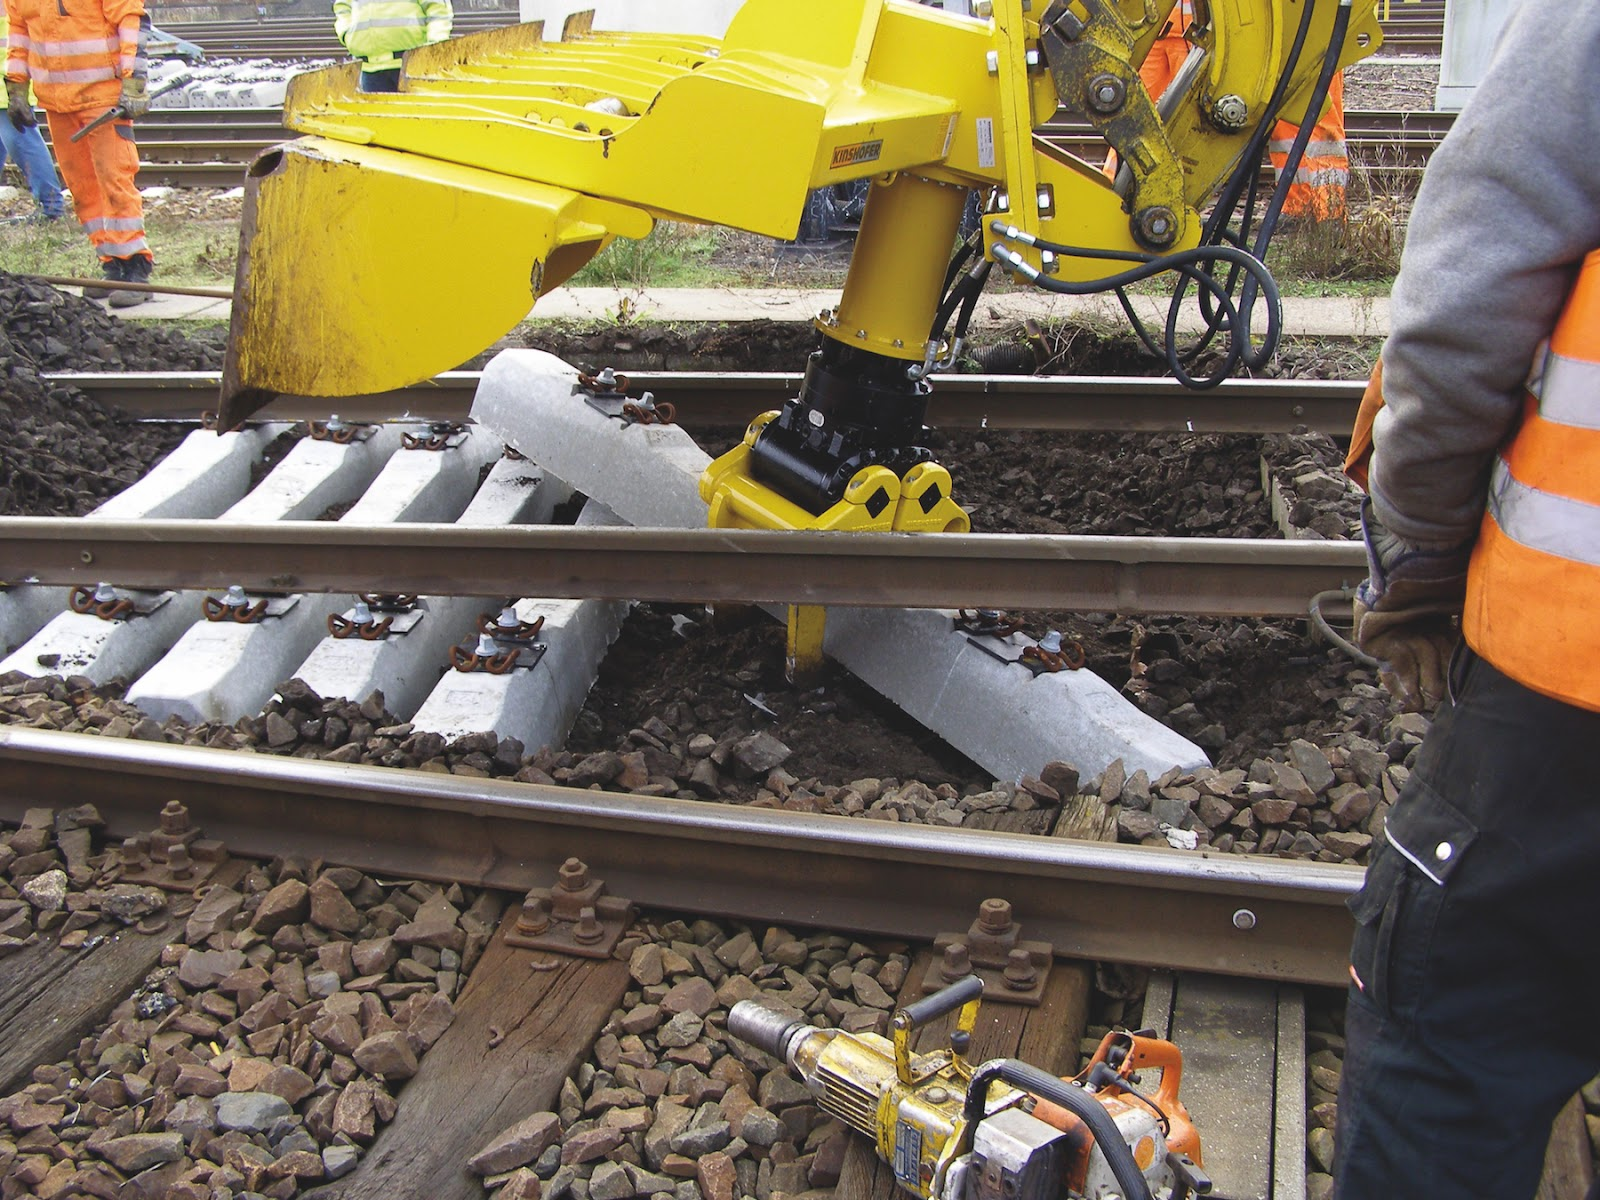 KINSHOFER's Railway Tie Changer Attachments Offer Efficient Railway